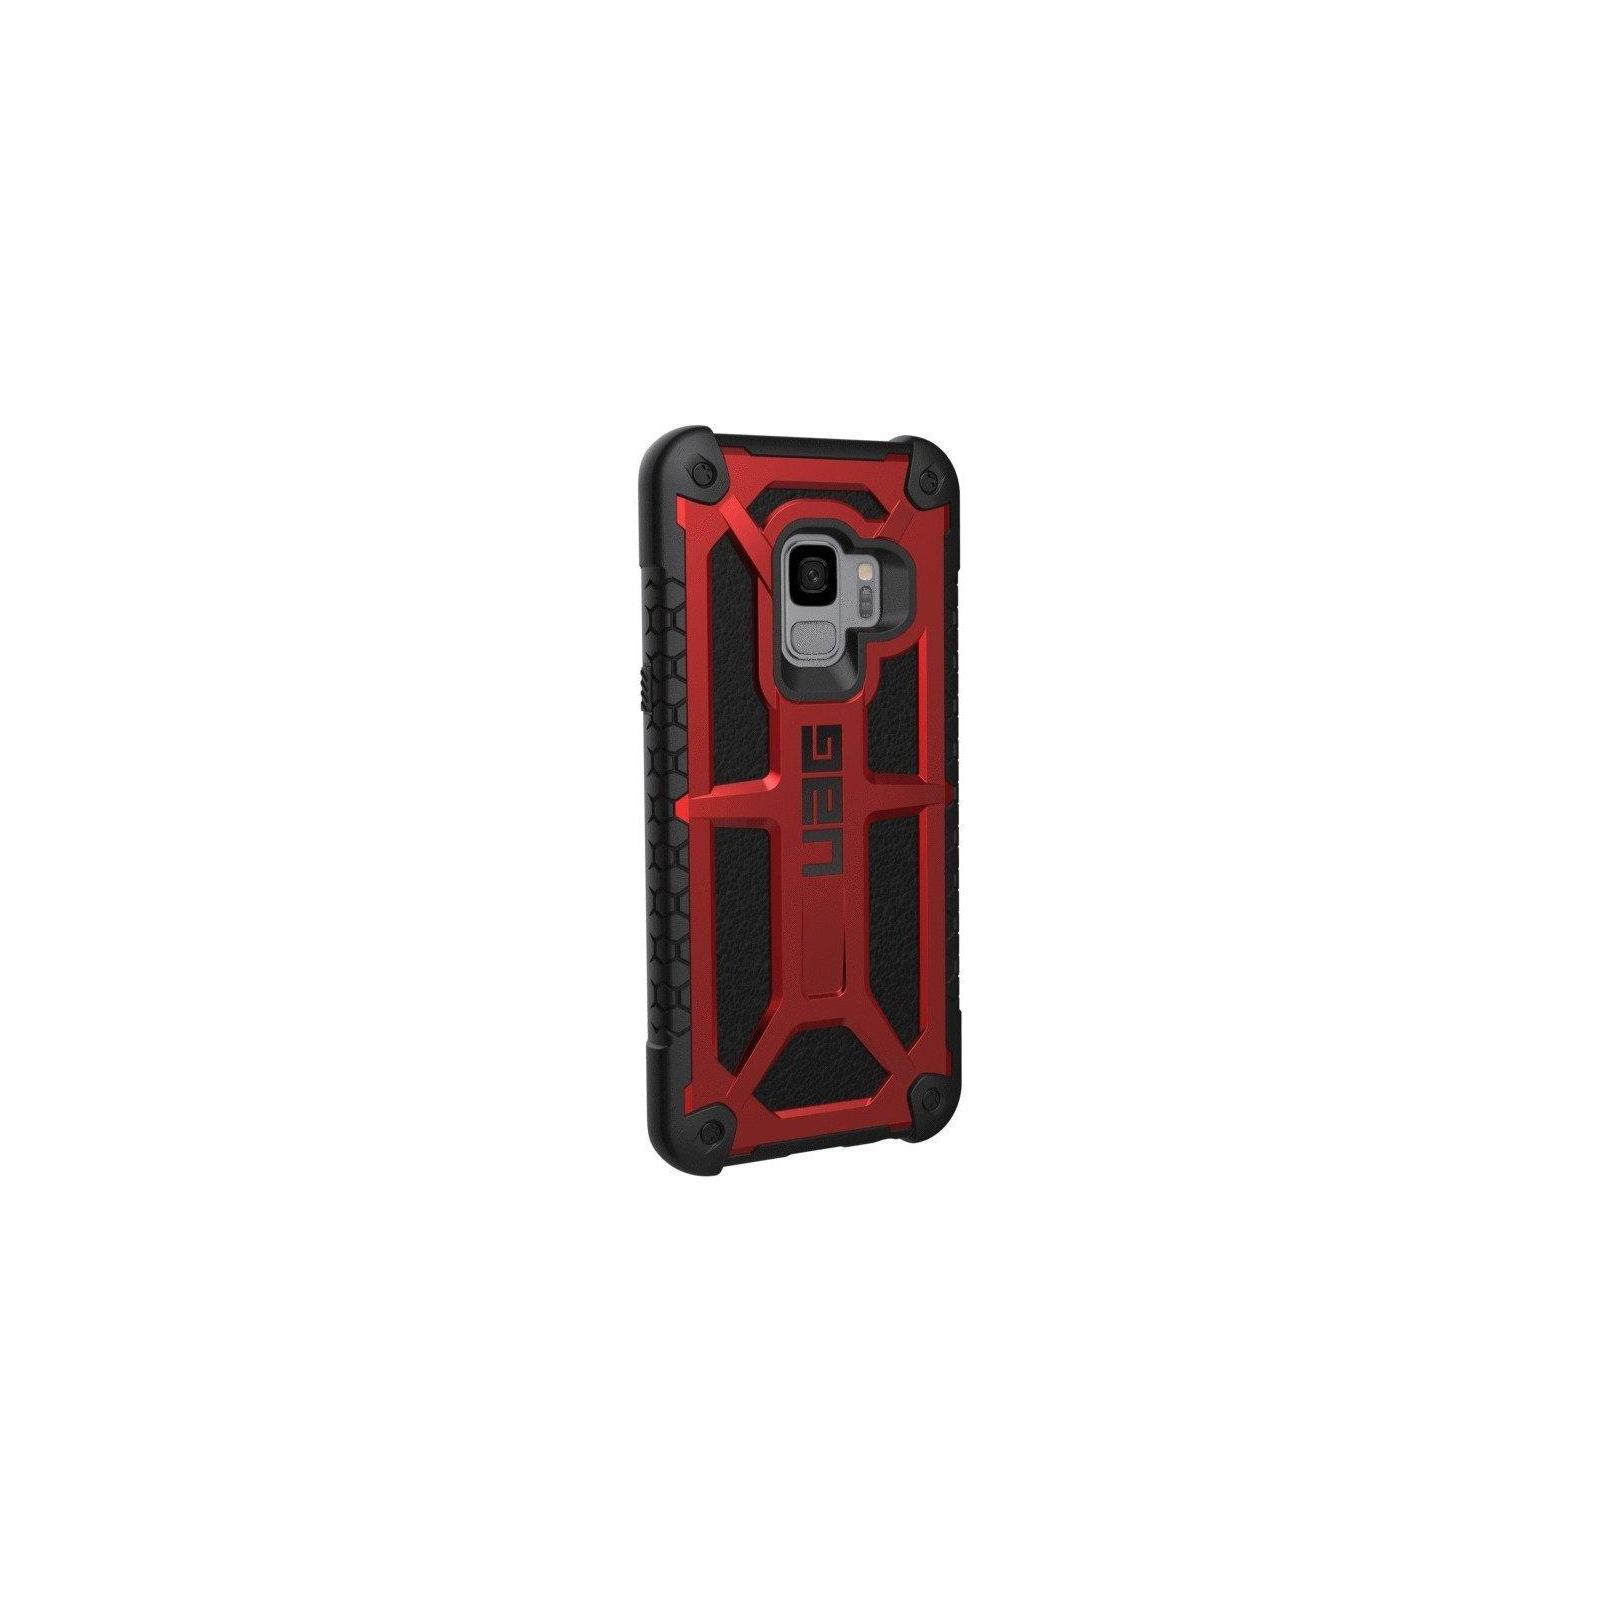 Чехол для моб. телефона Urban Armor Gear Galaxy S9 Monarch Crimson (GLXS9-M-CR) изображение 3